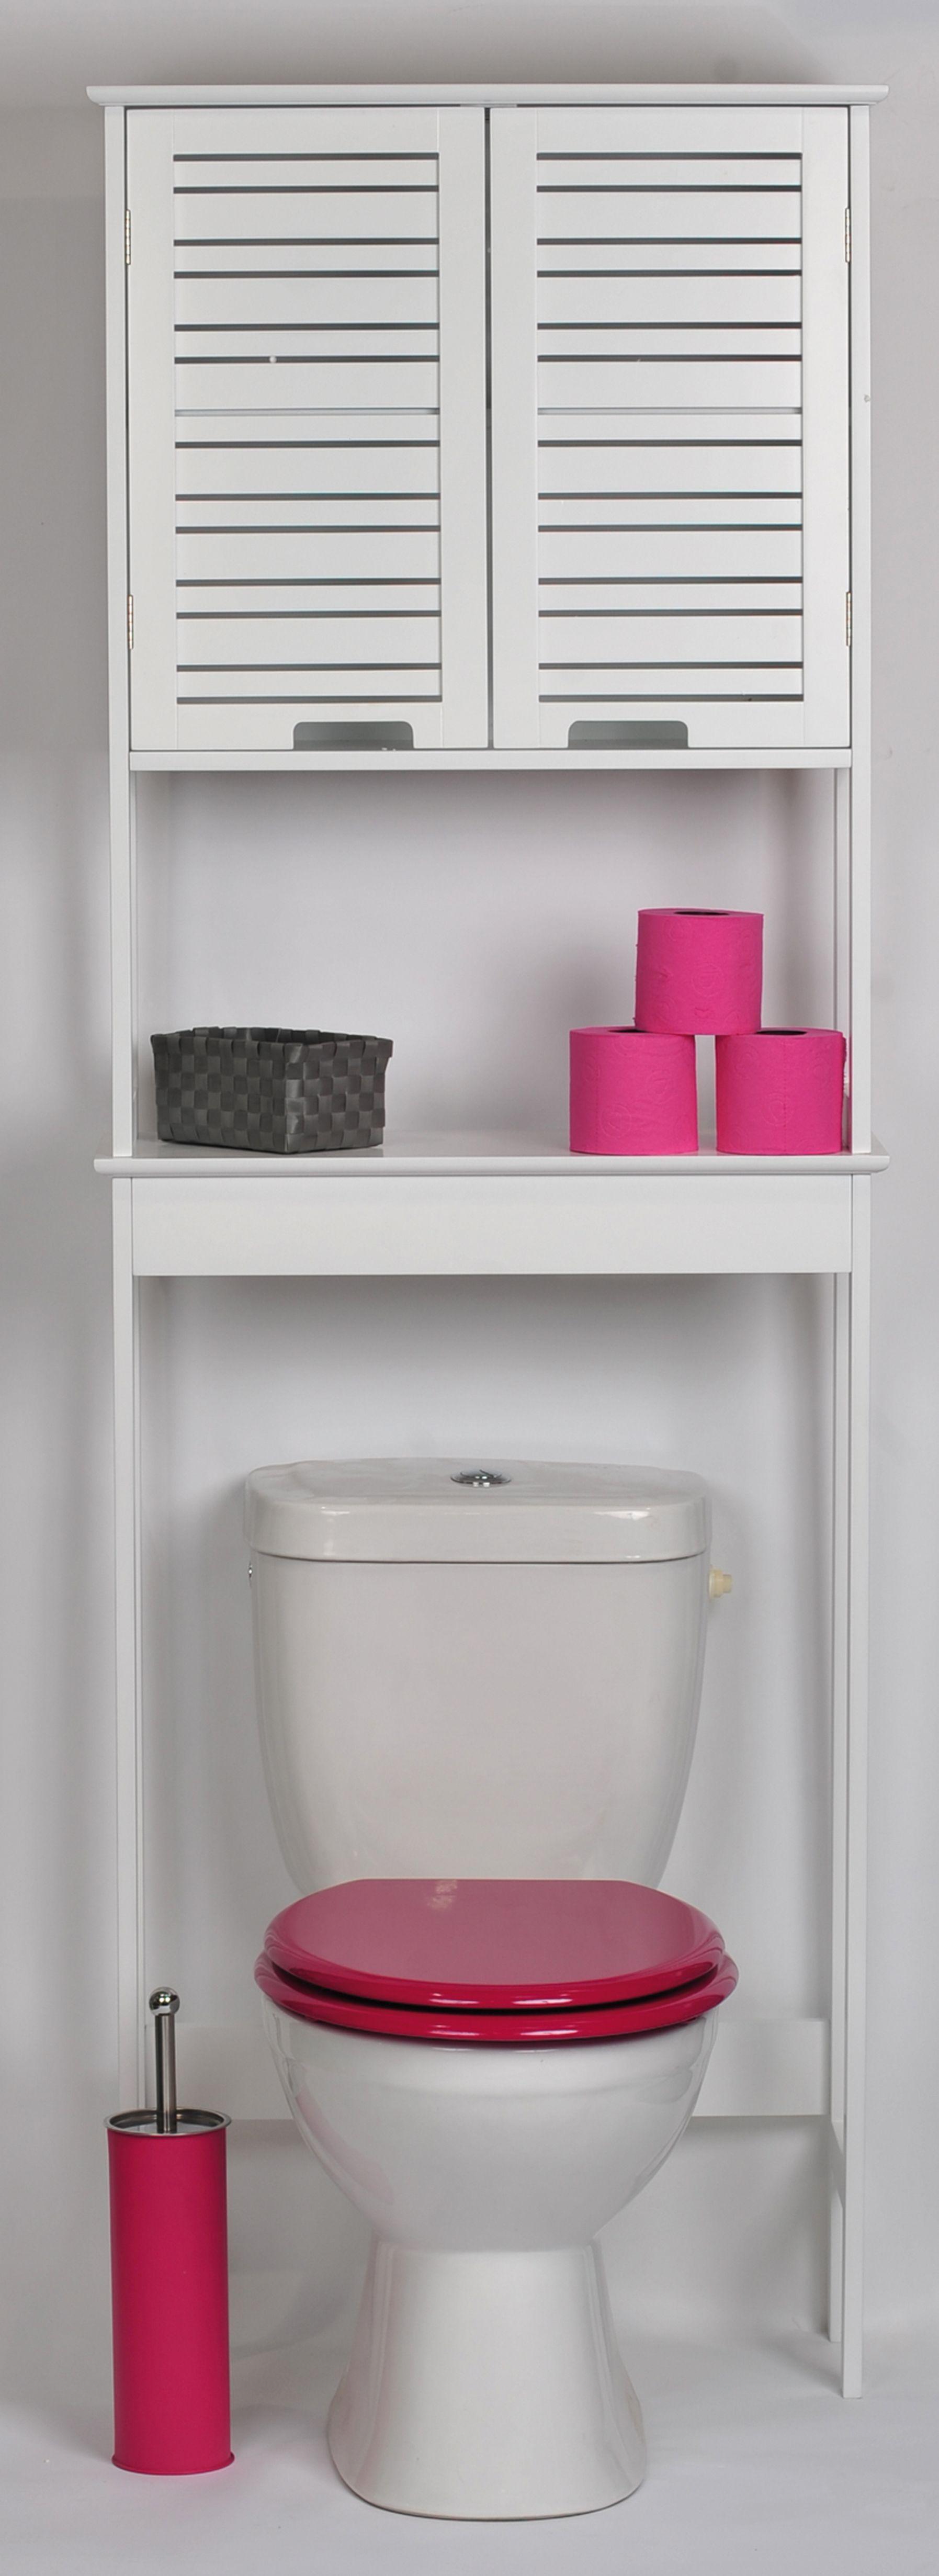 Meuble Wc Castorama With Wc Suspendu Of Meuble Wc Ikea Meuble Wc Suspendu 10 Messages Amenagement Toilettes Idee Toilettes Decoration Toilettes